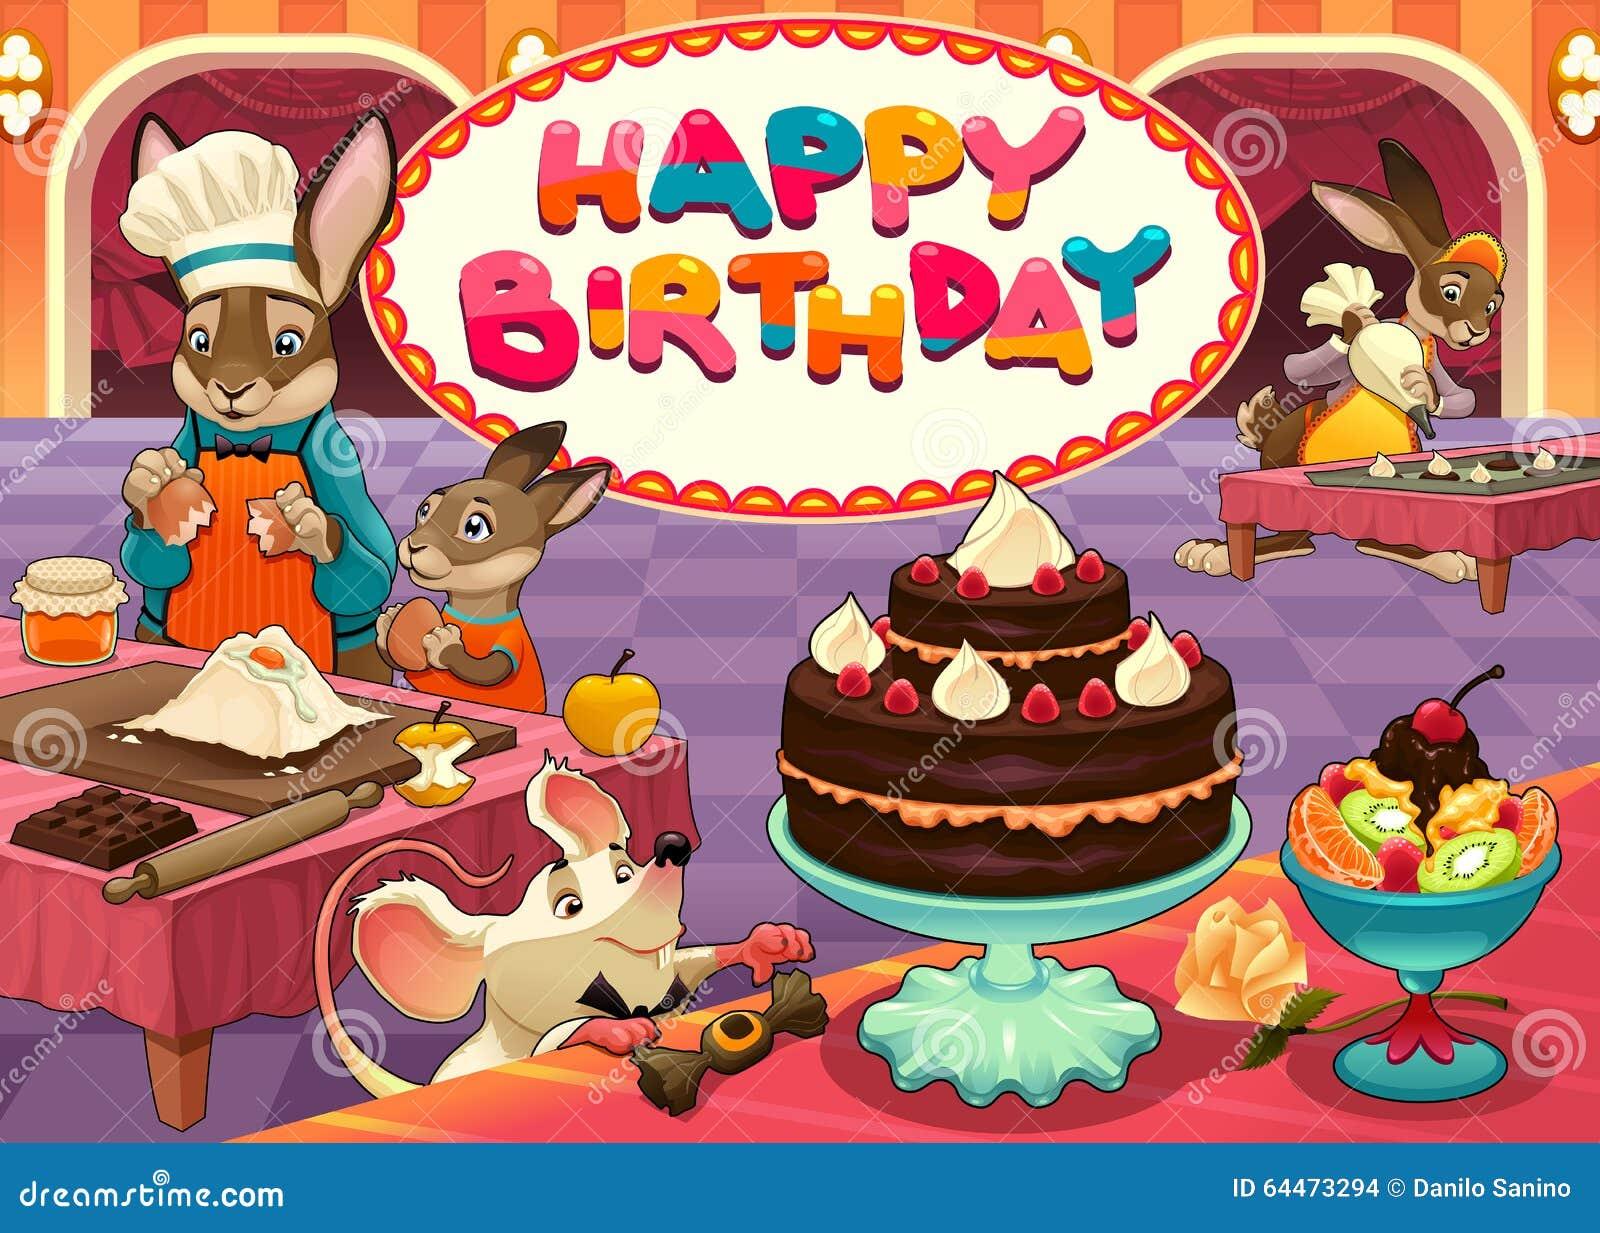 Открытка кулинару с днем рождения, днем рождения